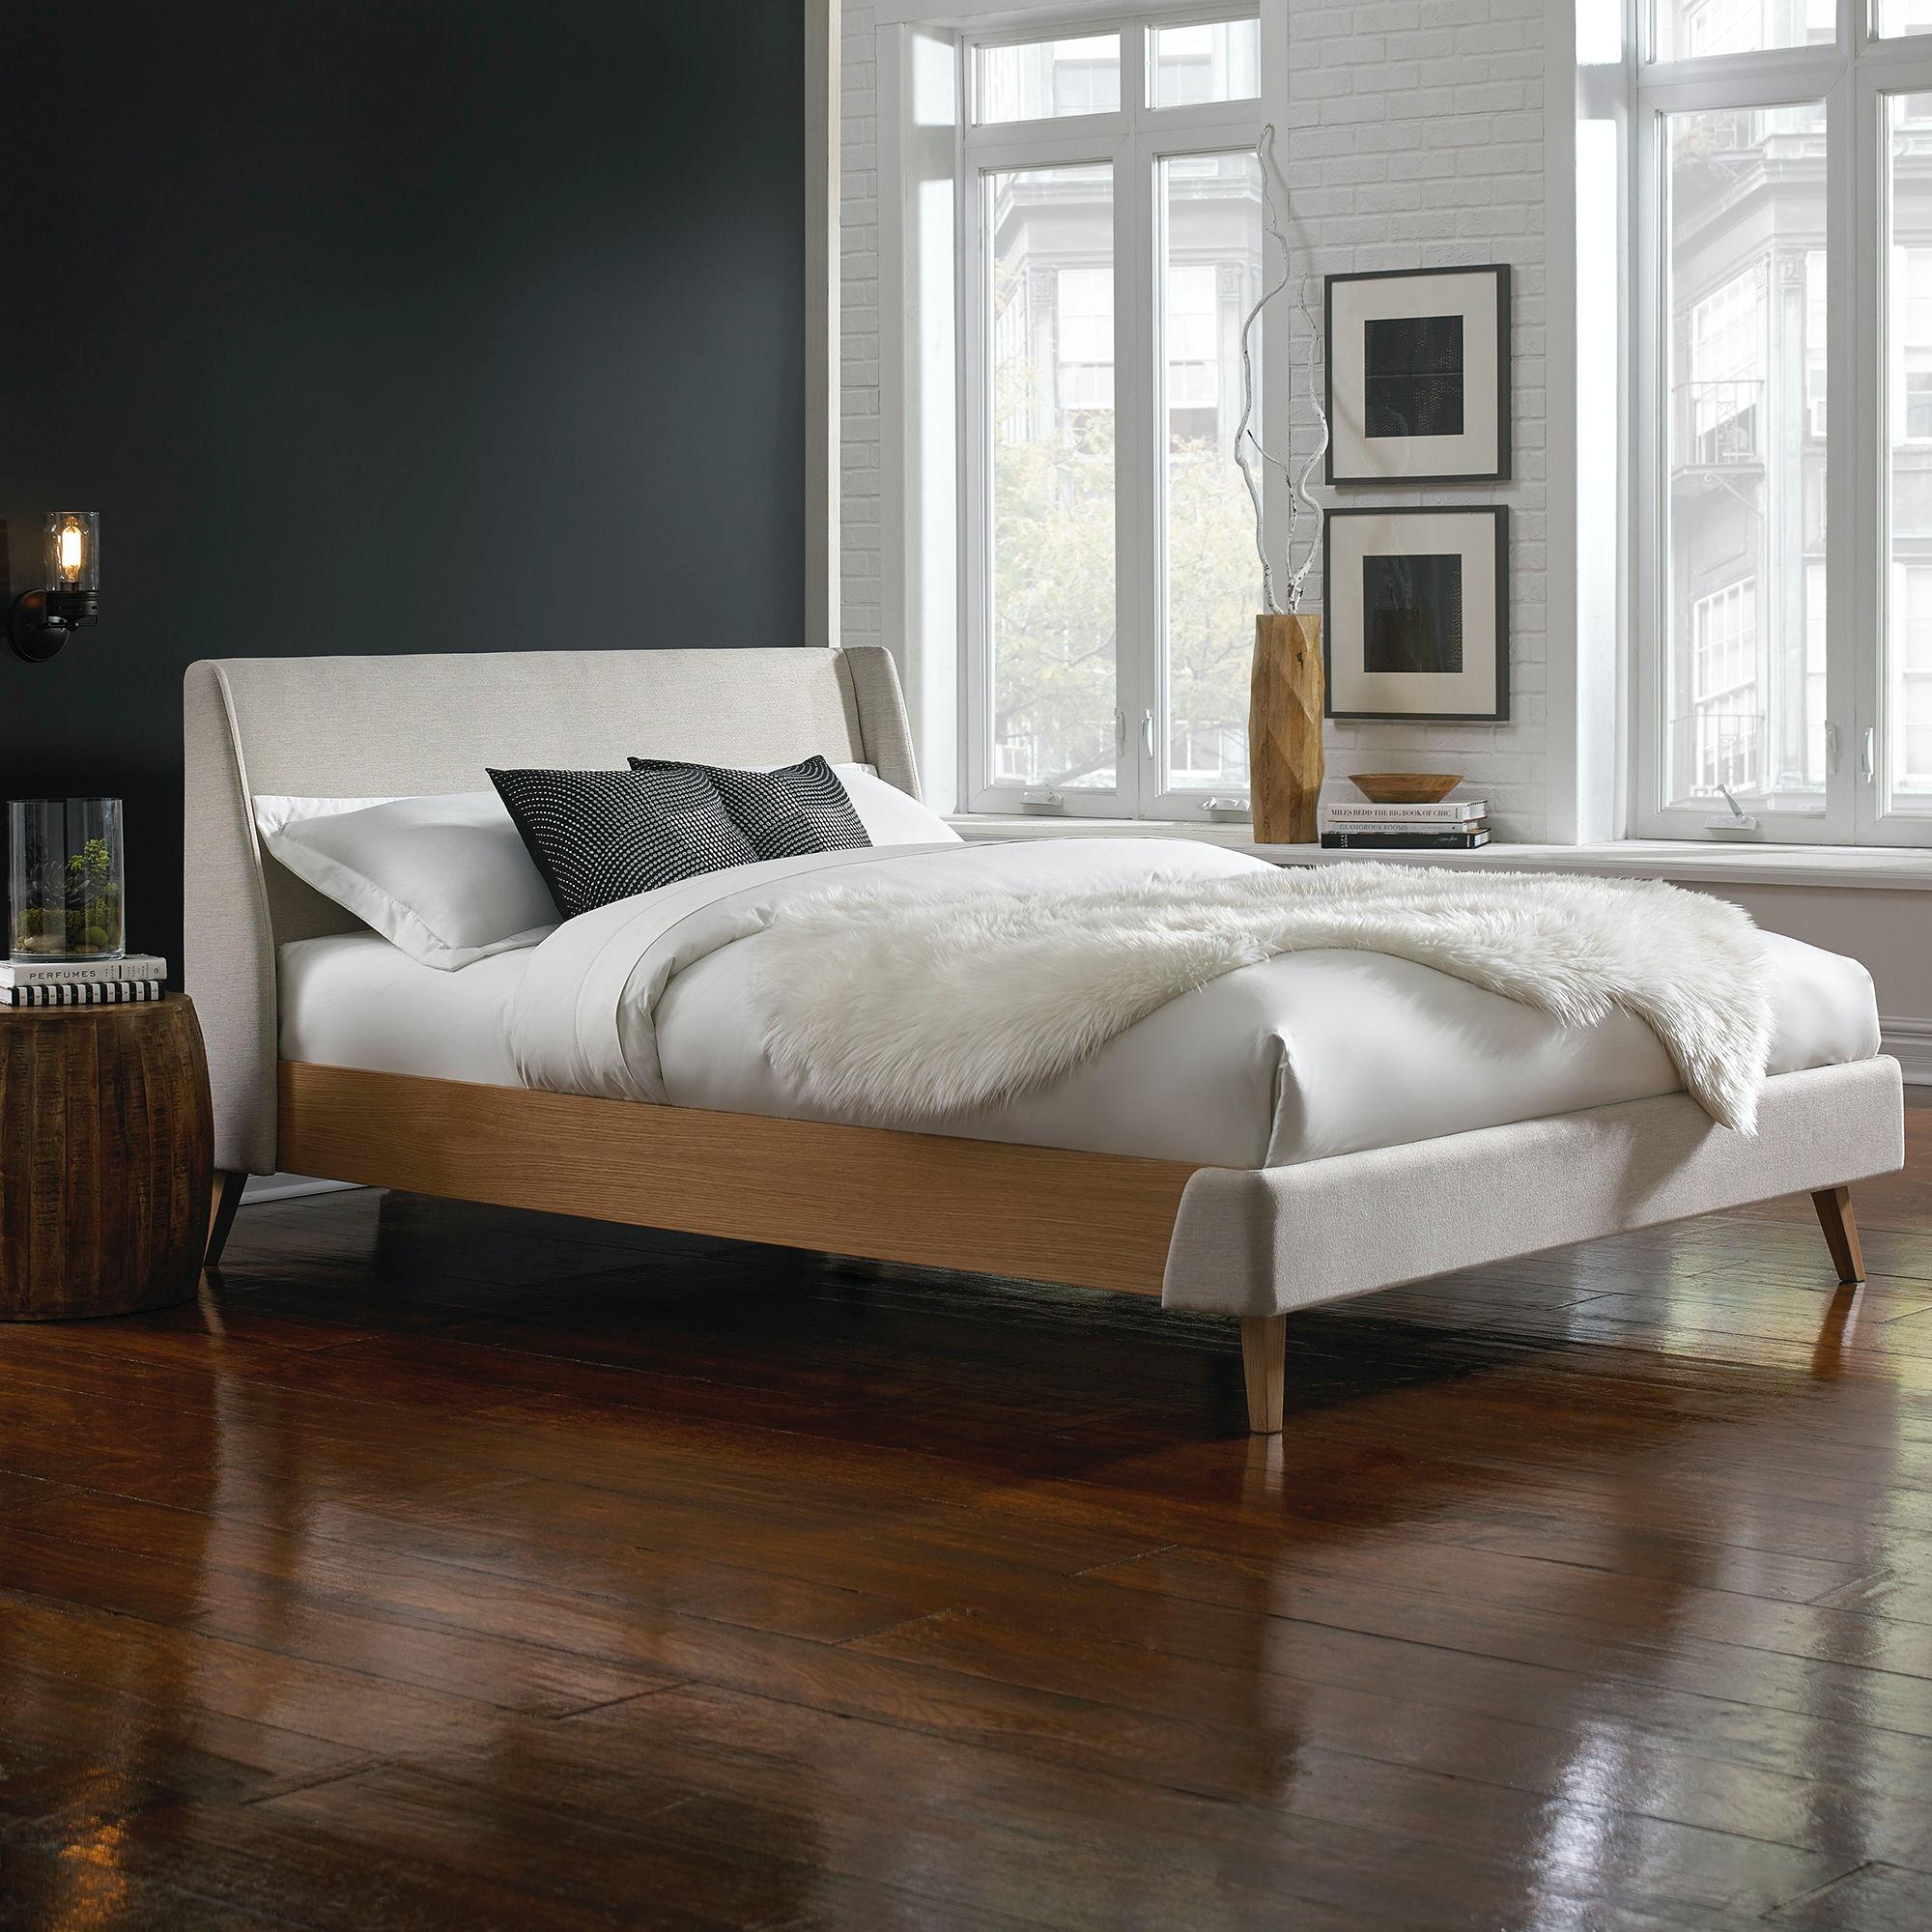 Fashion Bed Group Bedroom Palmer plete Platform Bed with